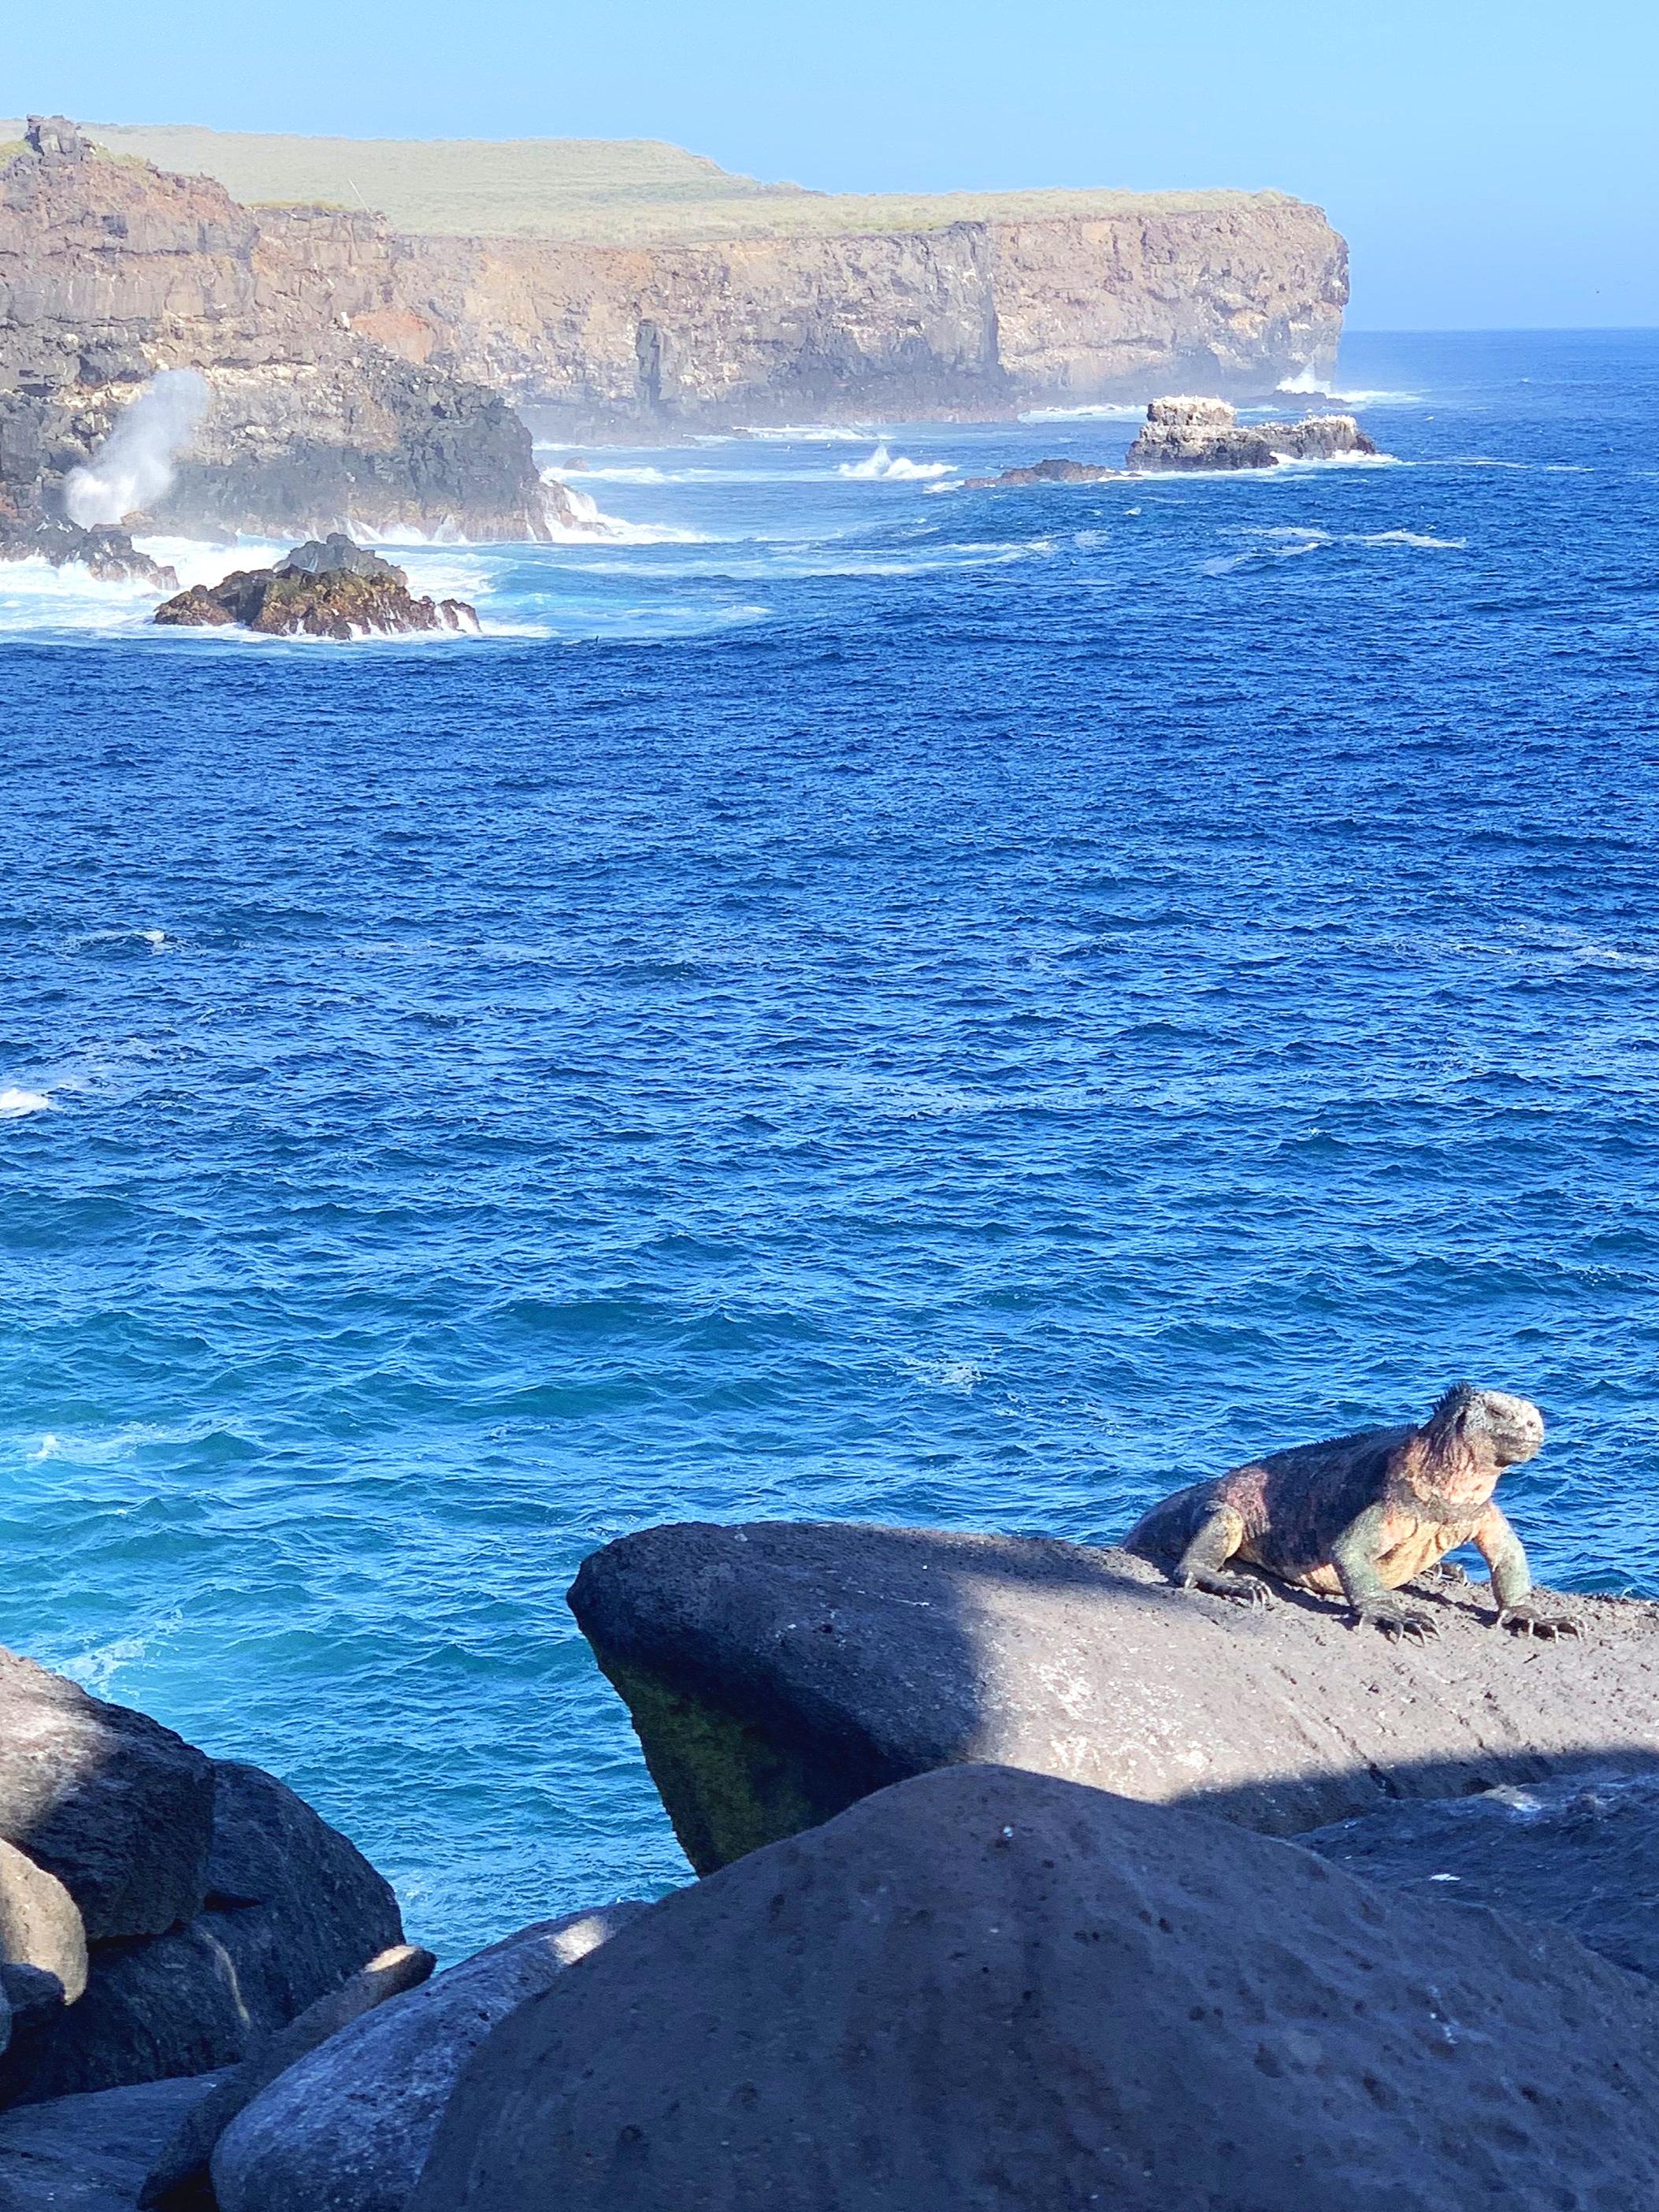 The coastline might look slightly Cornish but the wildlife definitely isn't!